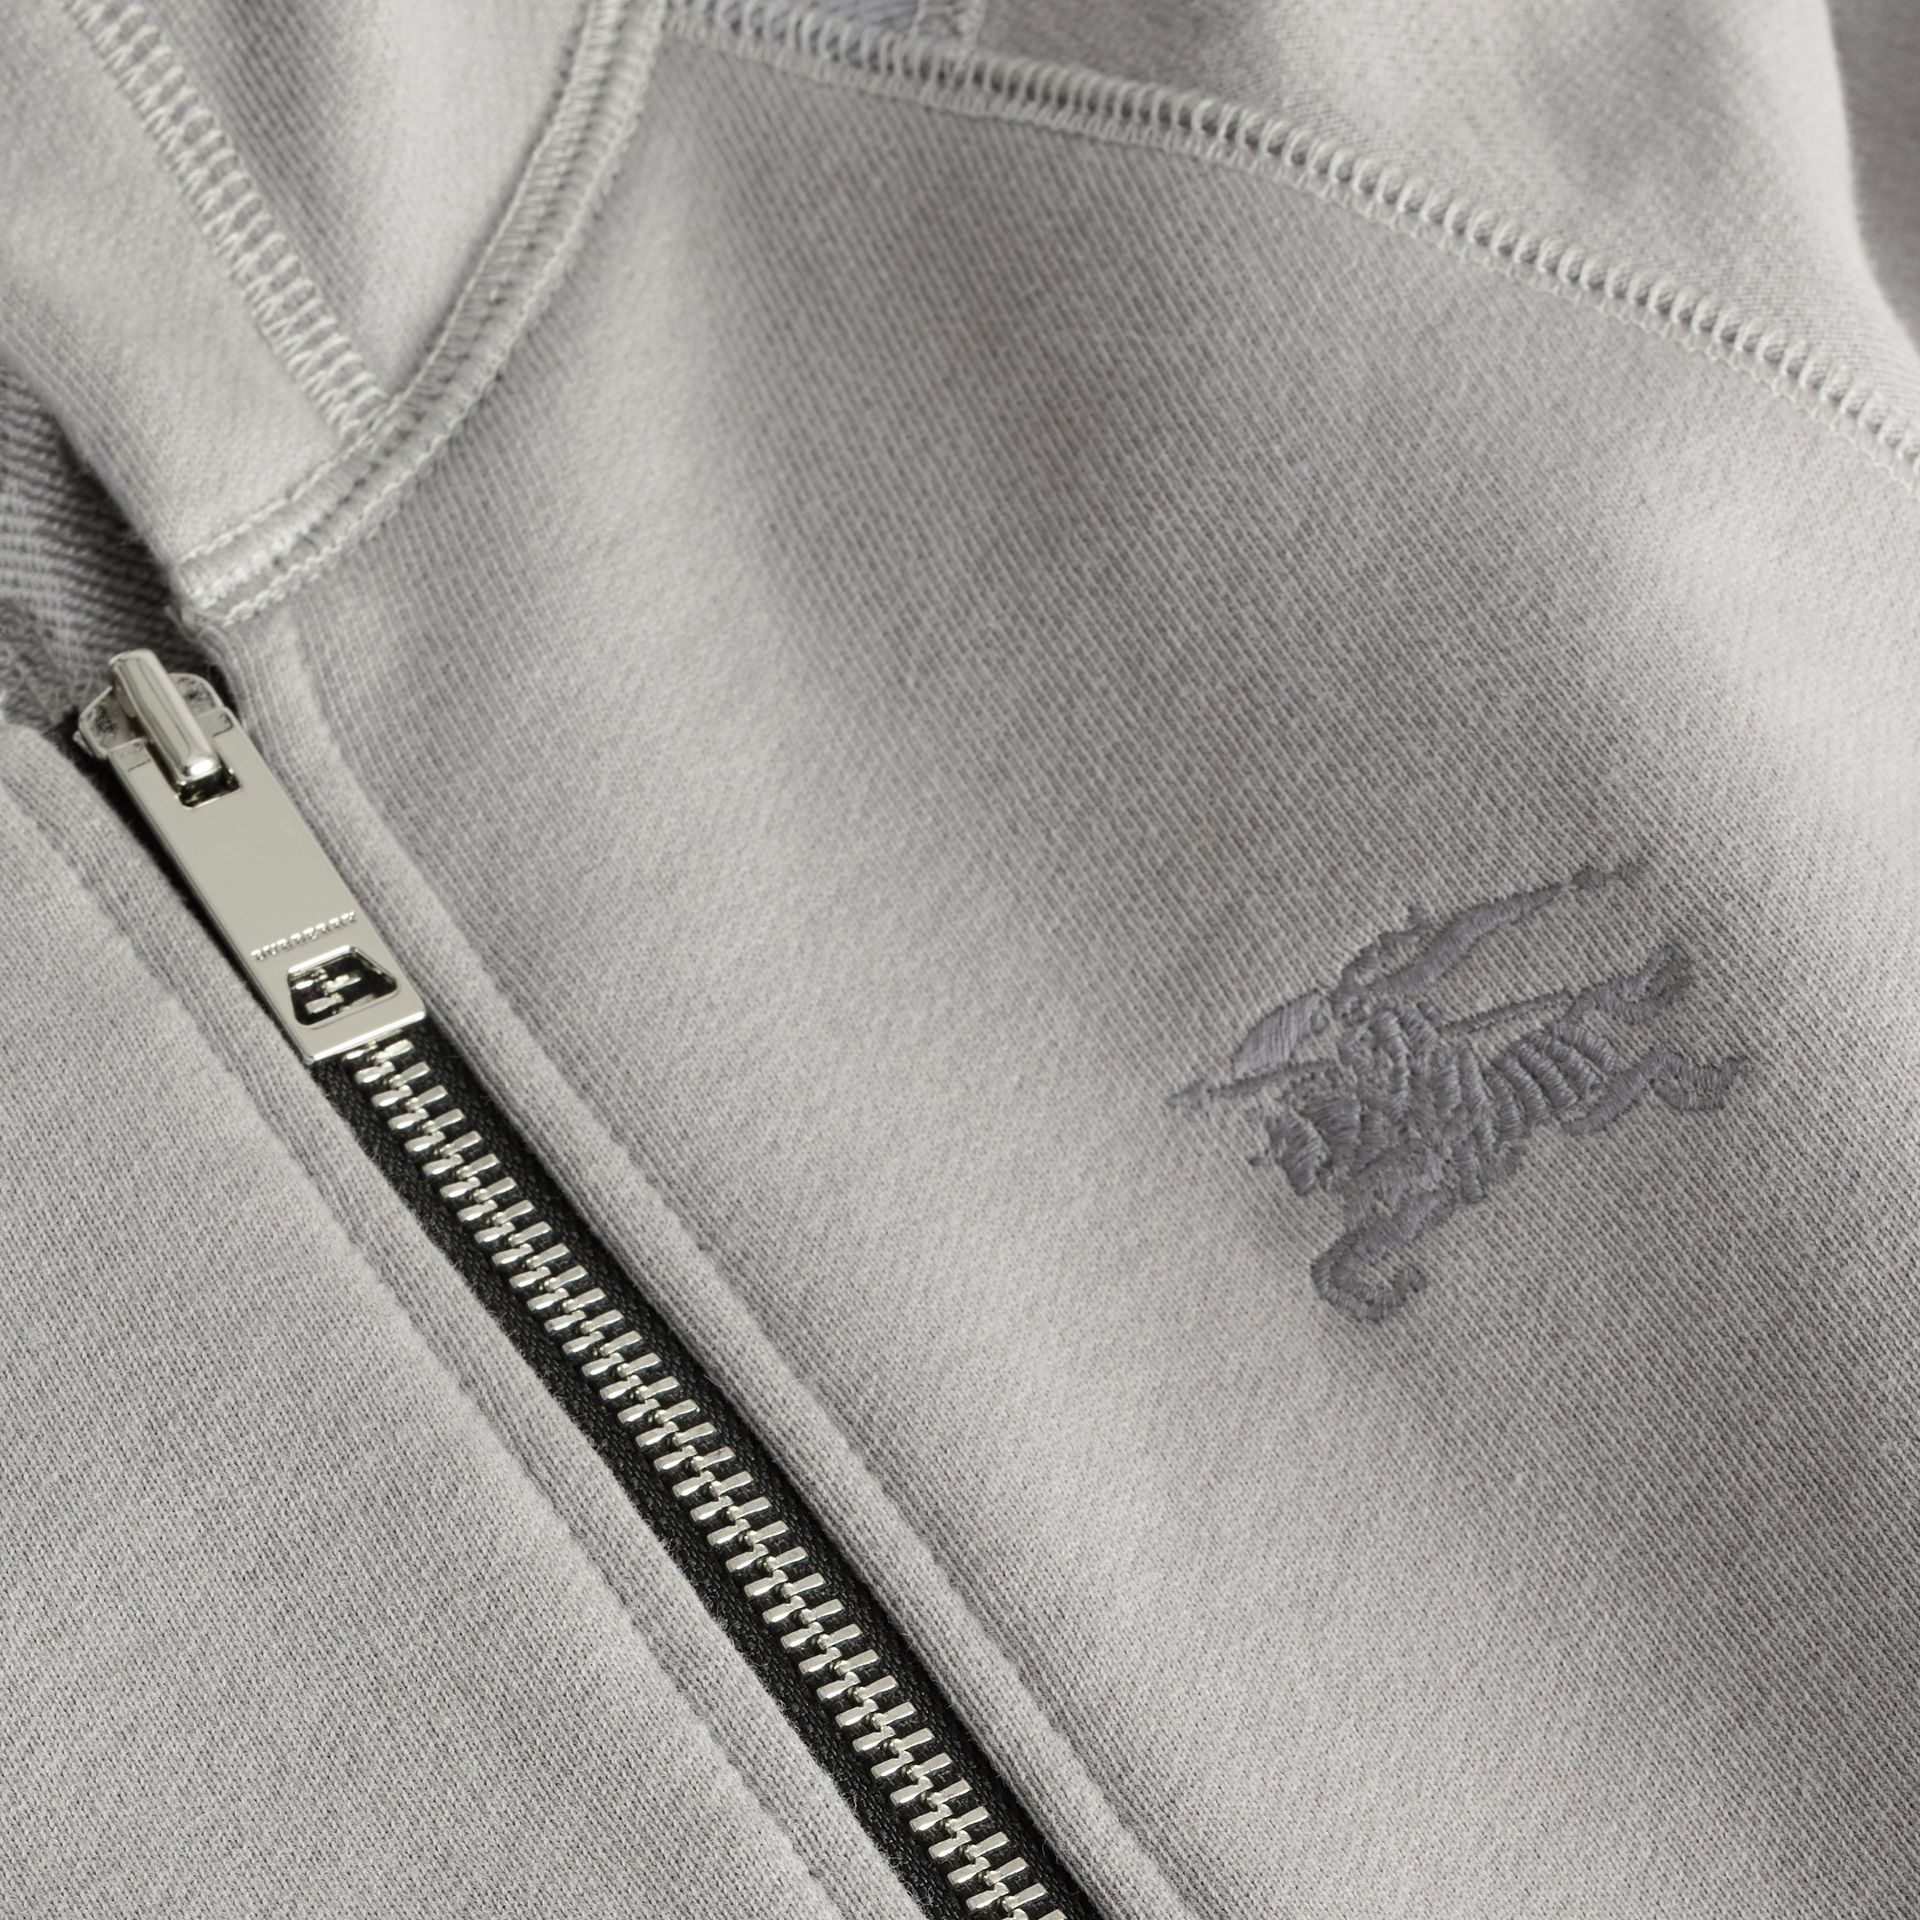 Cotton Jersey Hooded Top in Chalk Grey Melange | Burberry Australia - gallery image 1